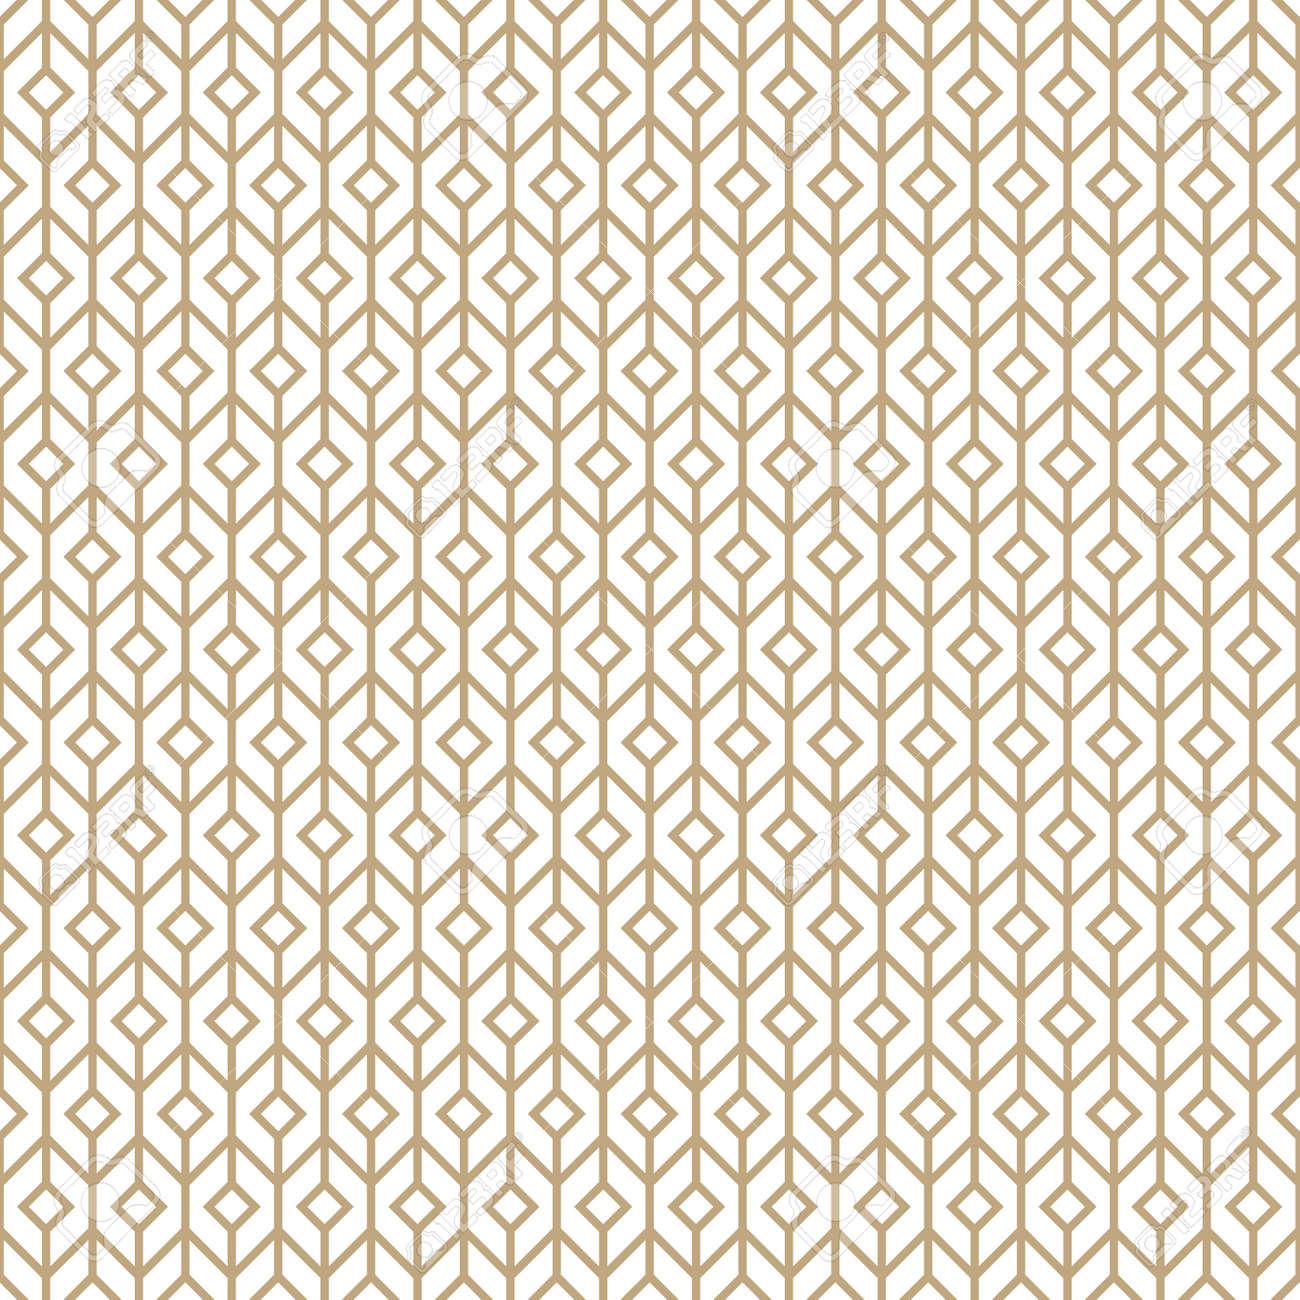 Seamless simple gold geometric pattern. Vector linear modern texture. - 151009239